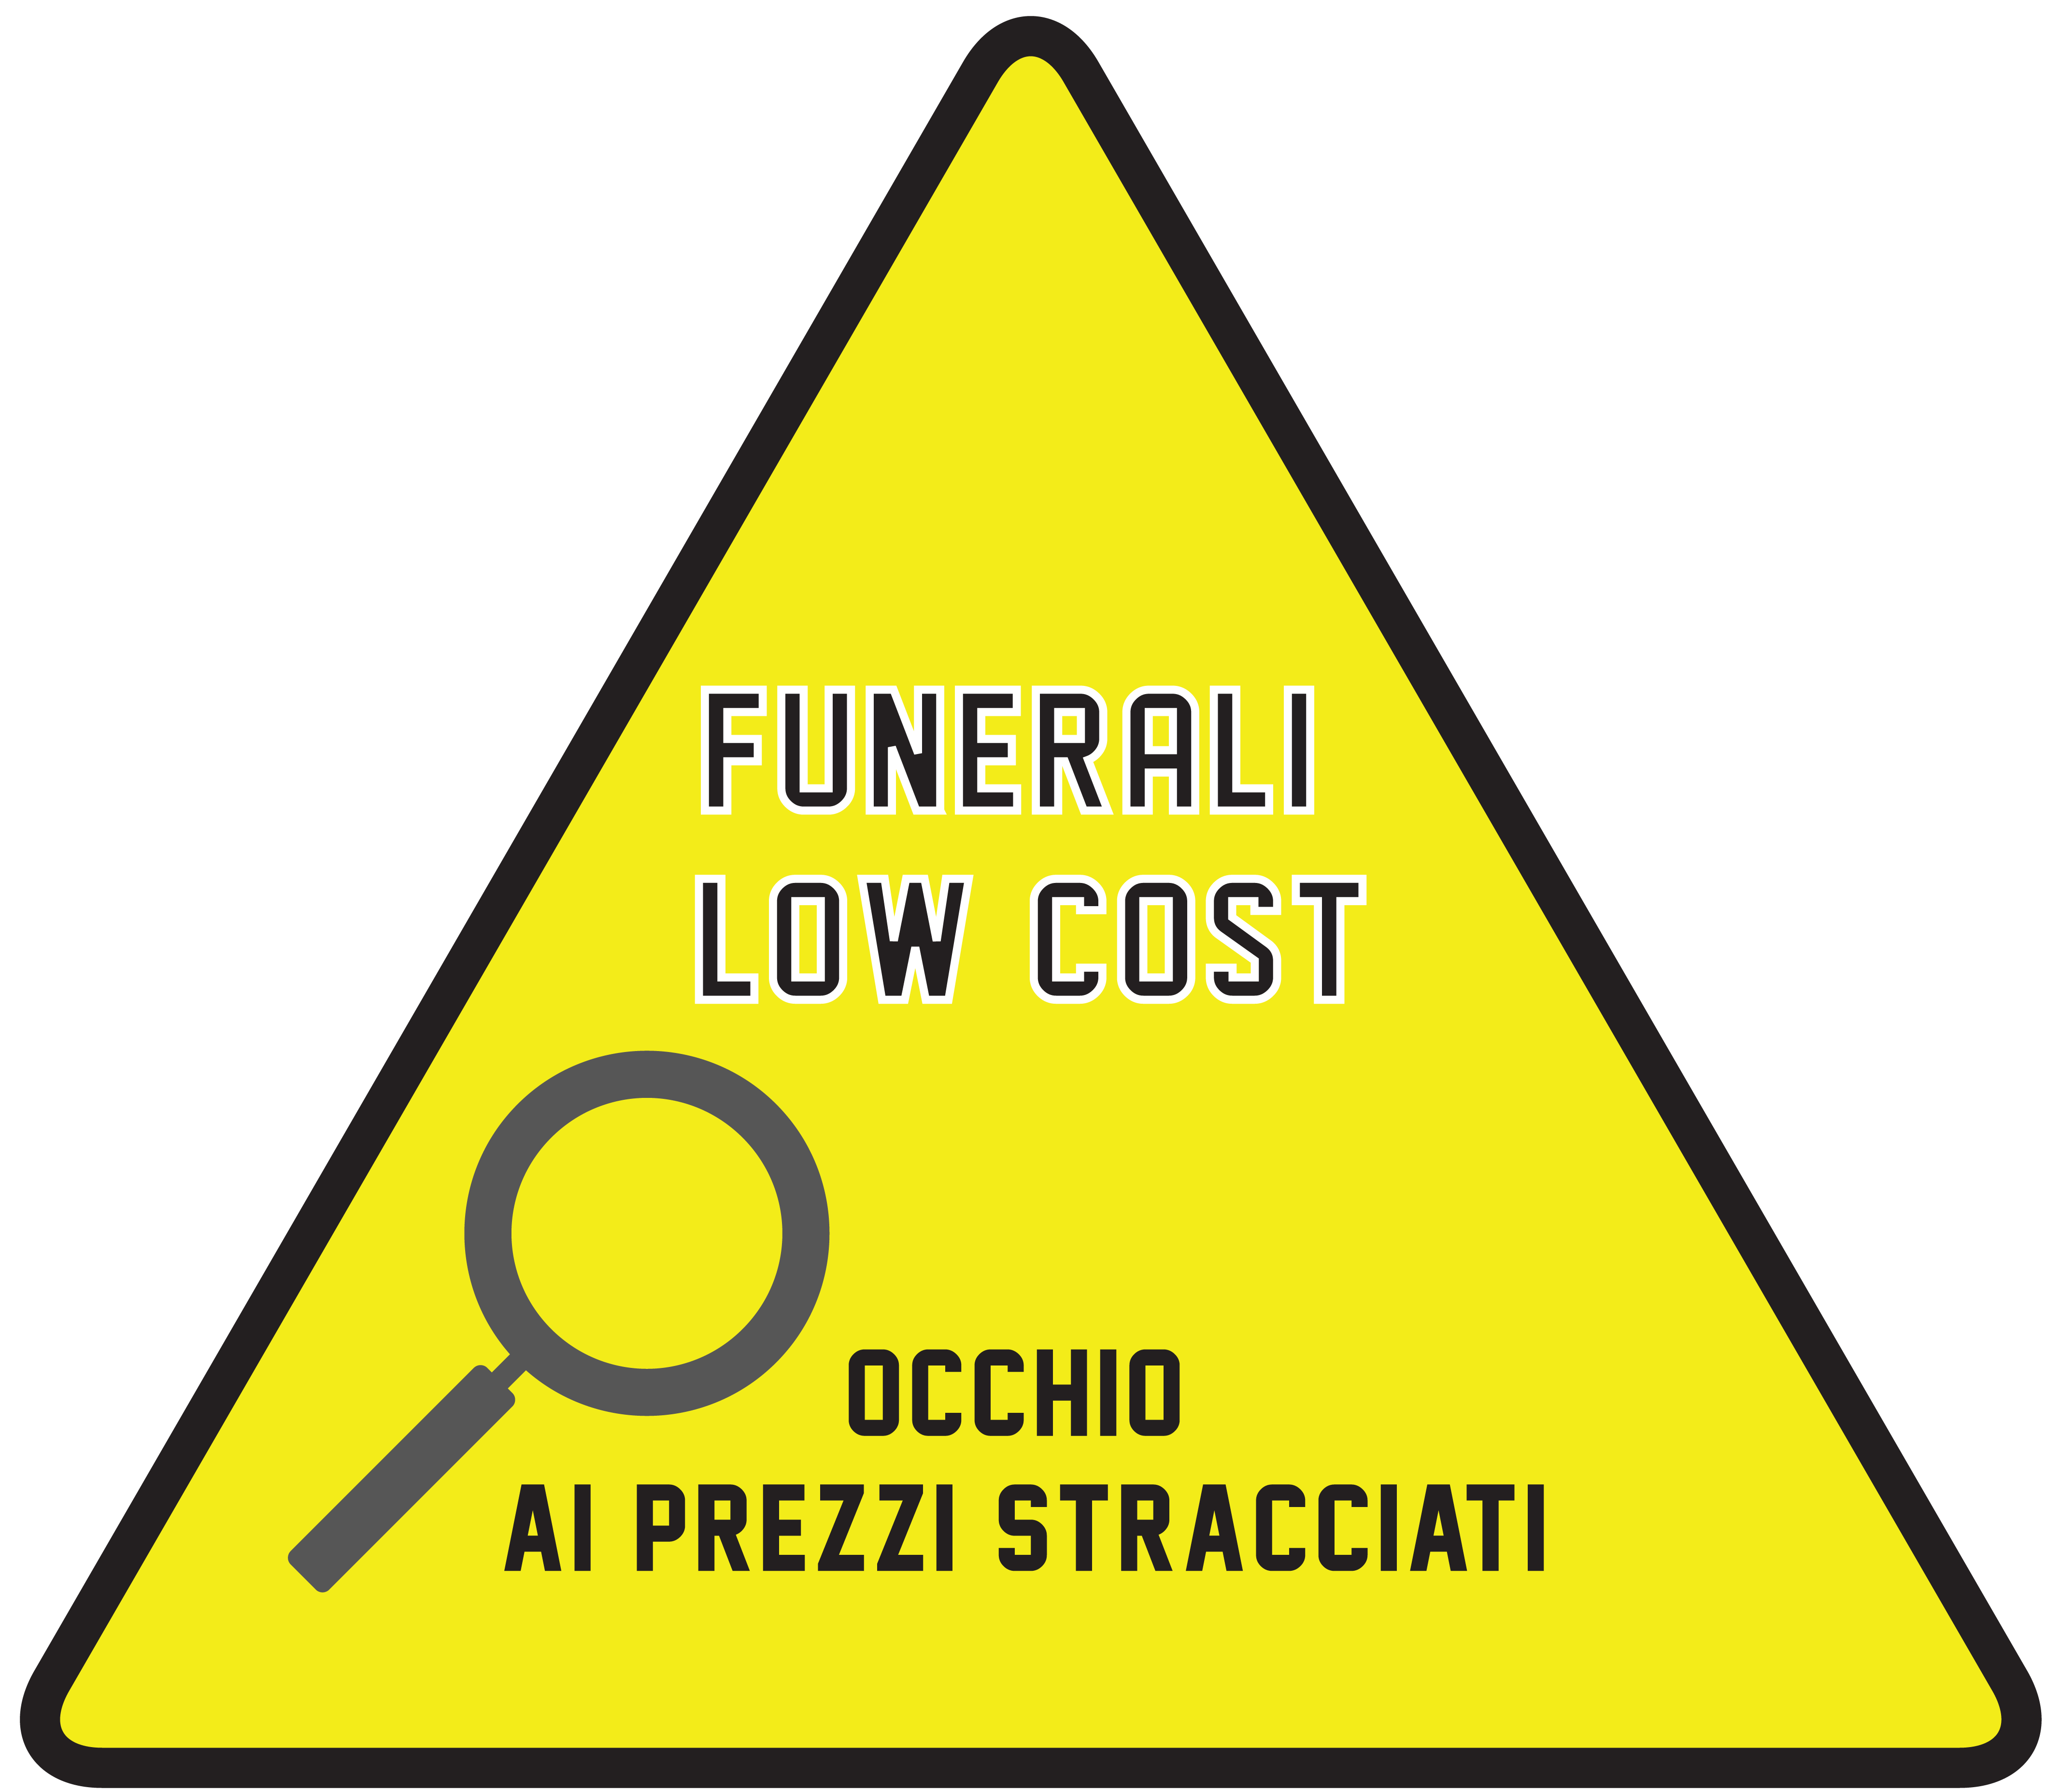 Funerali low cost